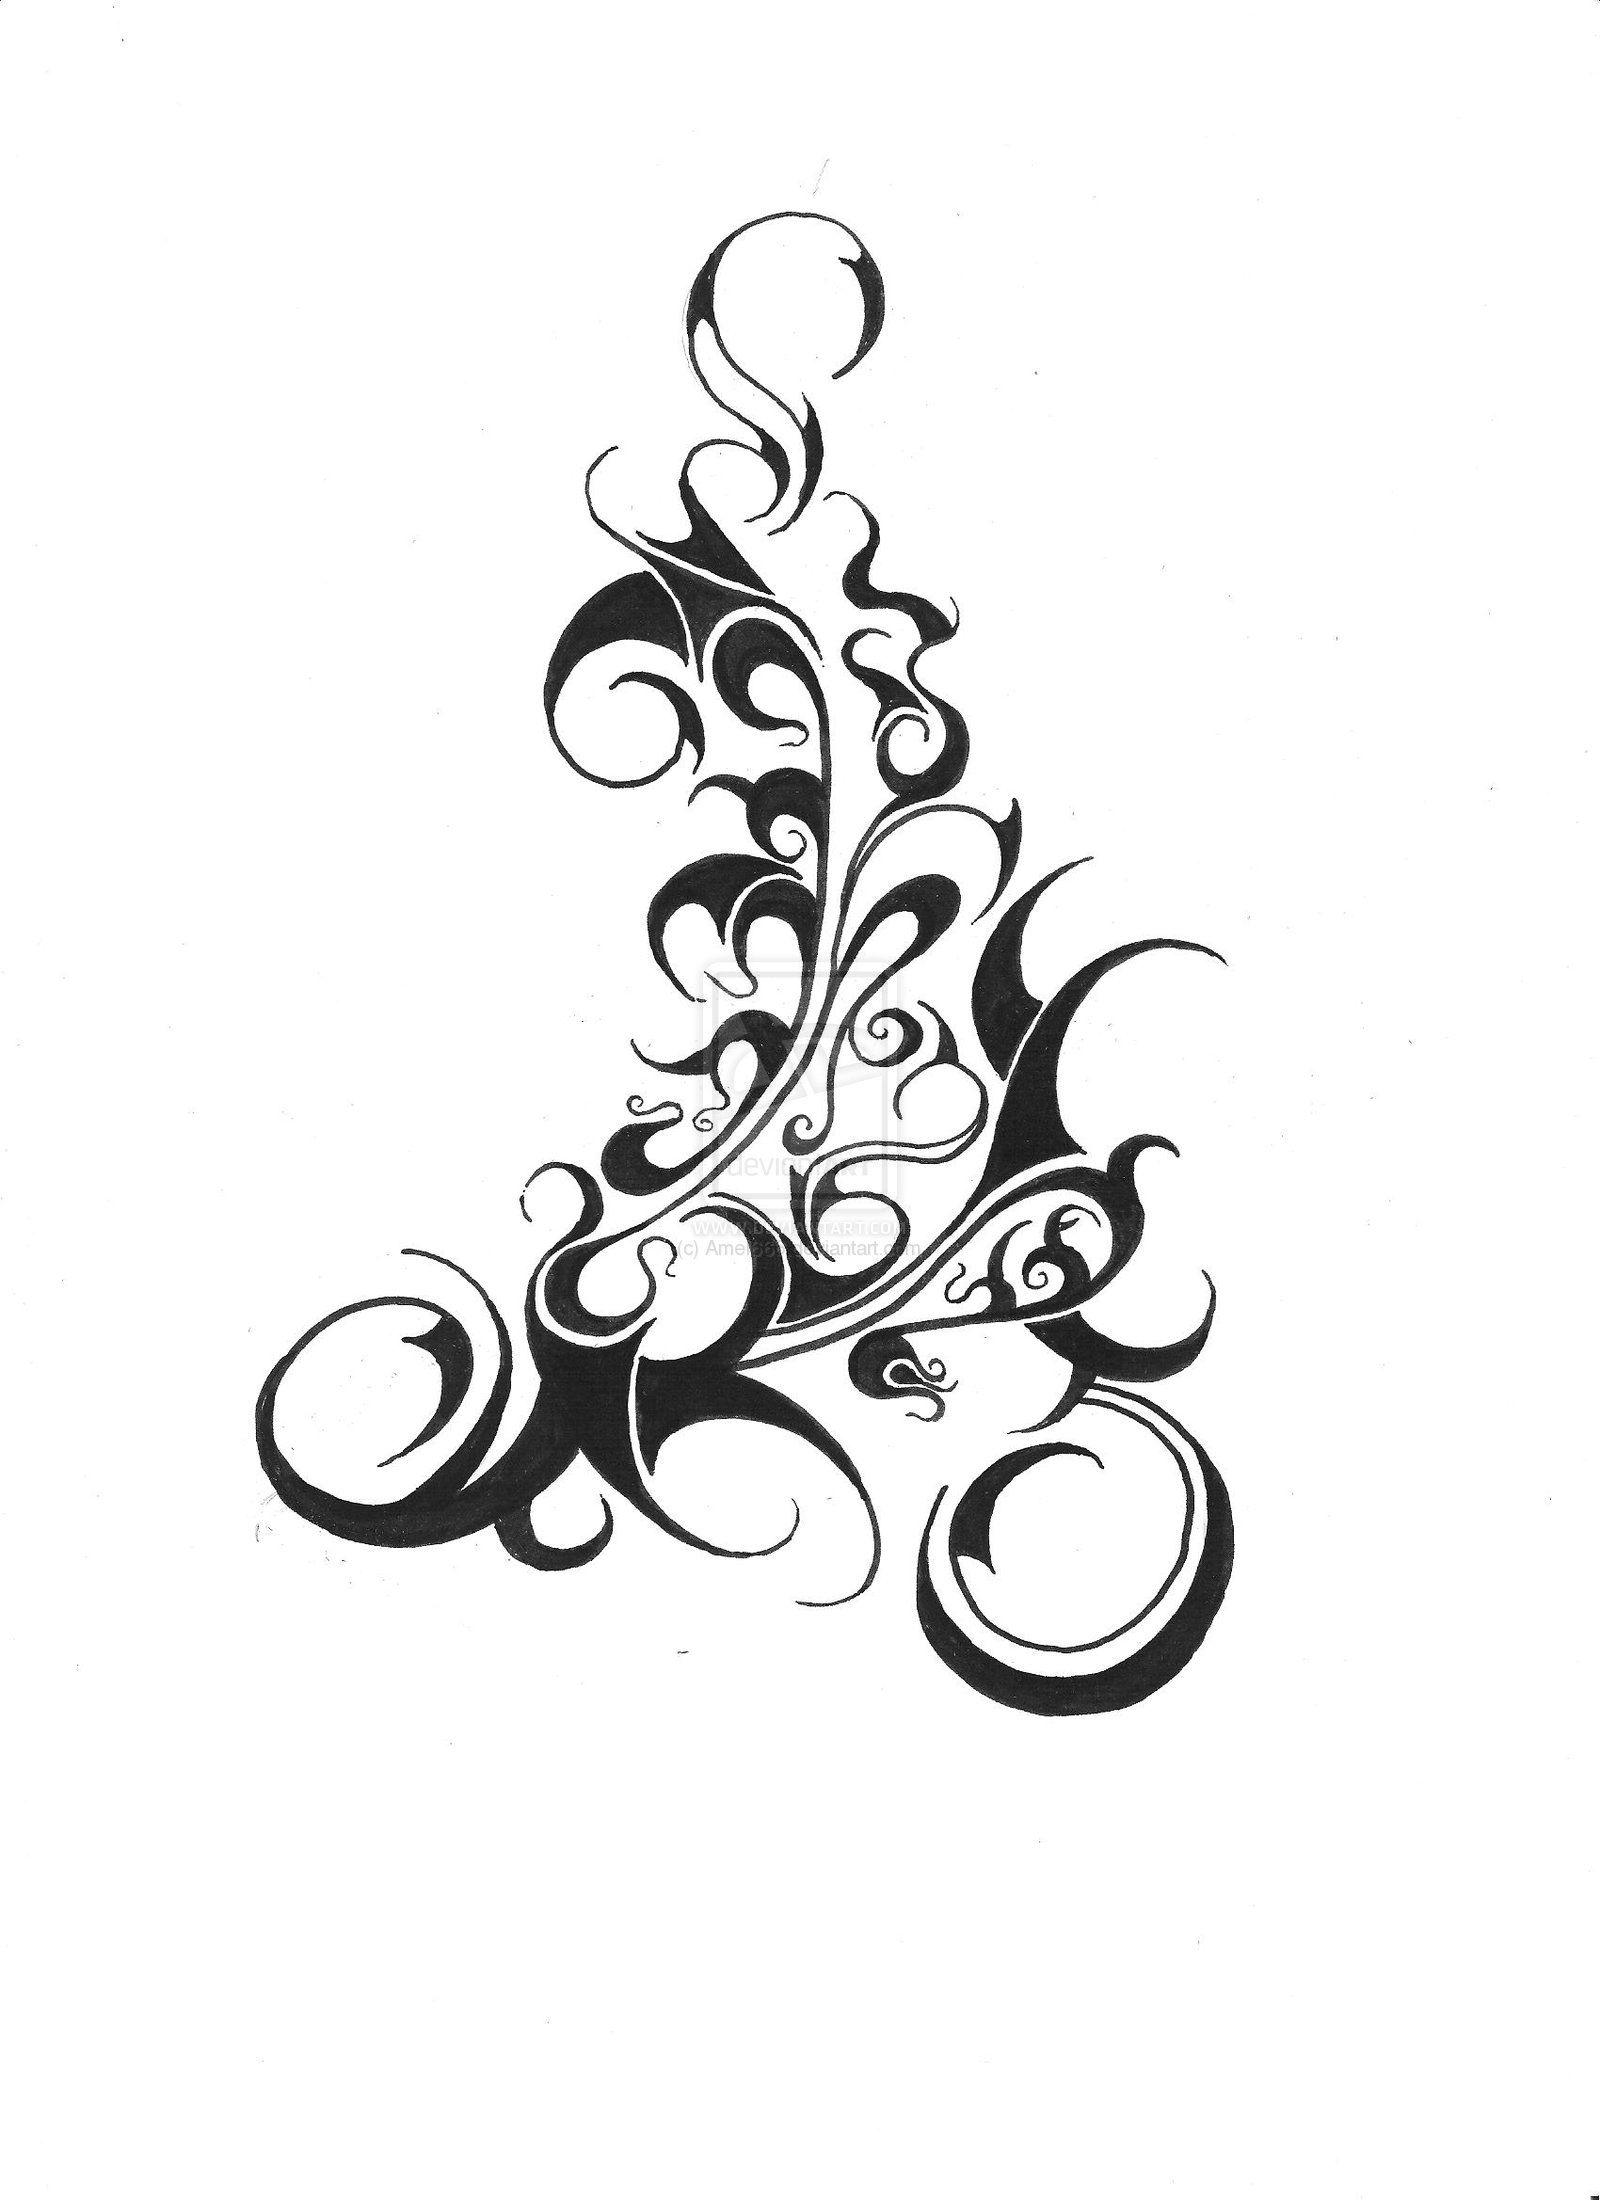 Goth+Tattoo+by+Amel666.deviantart.com+on+@deviantART